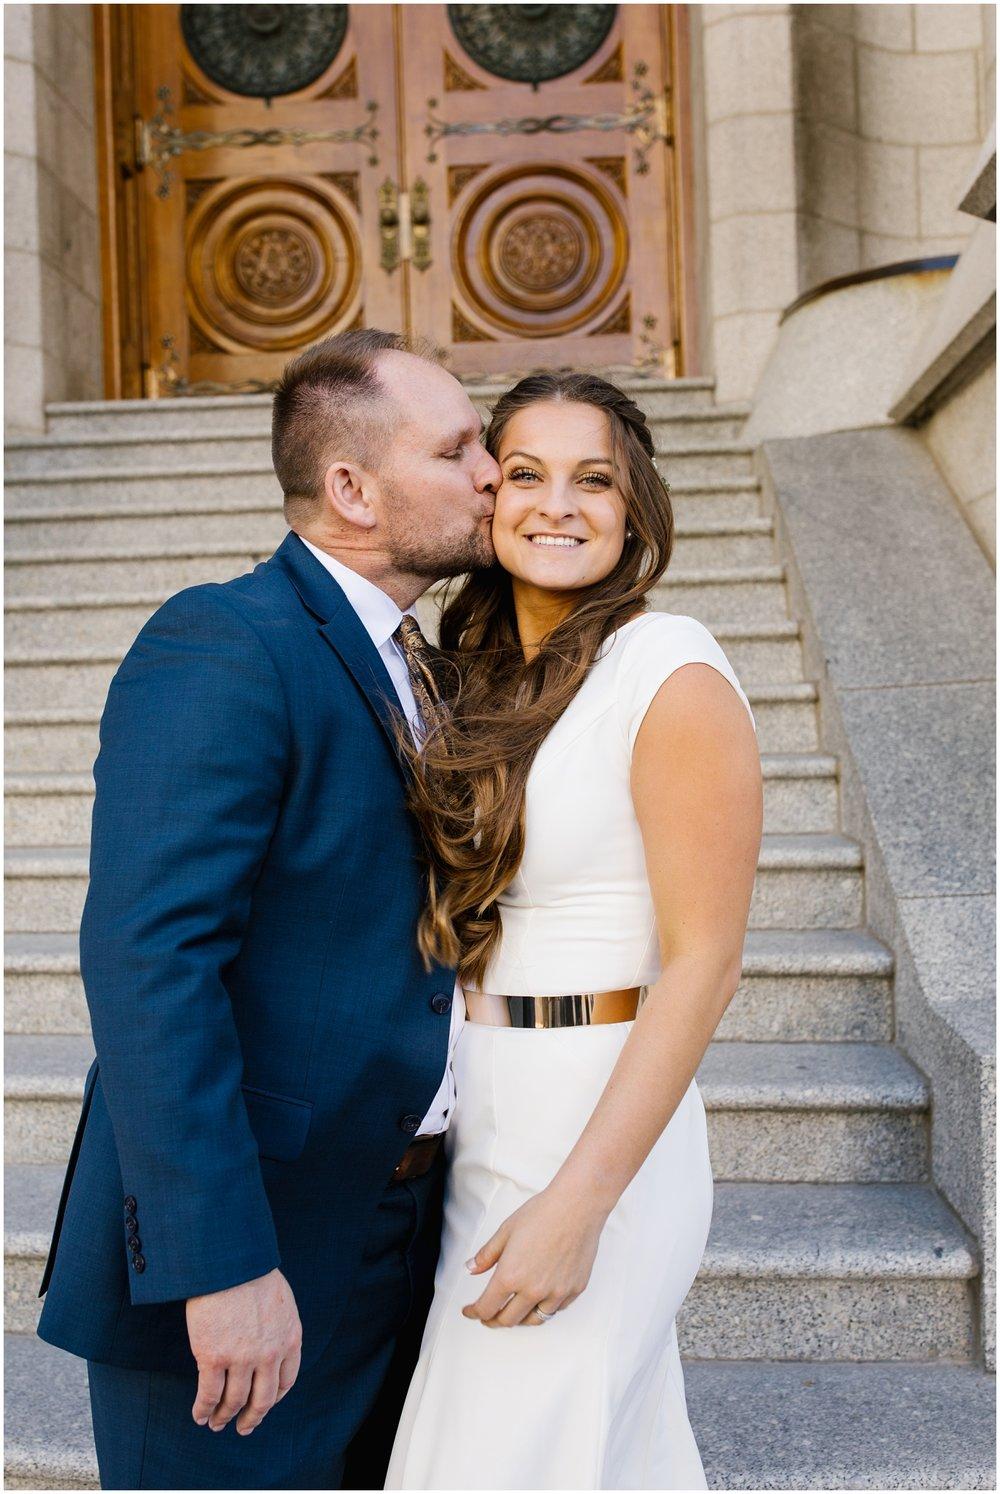 JC-Wedding-101_Lizzie-B-Imagery-Utah-Wedding-Photographer-Park-City-Salt-Lake-City-Temple-Joseph-Smith-Memorial-Building-Empire-Room.jpg